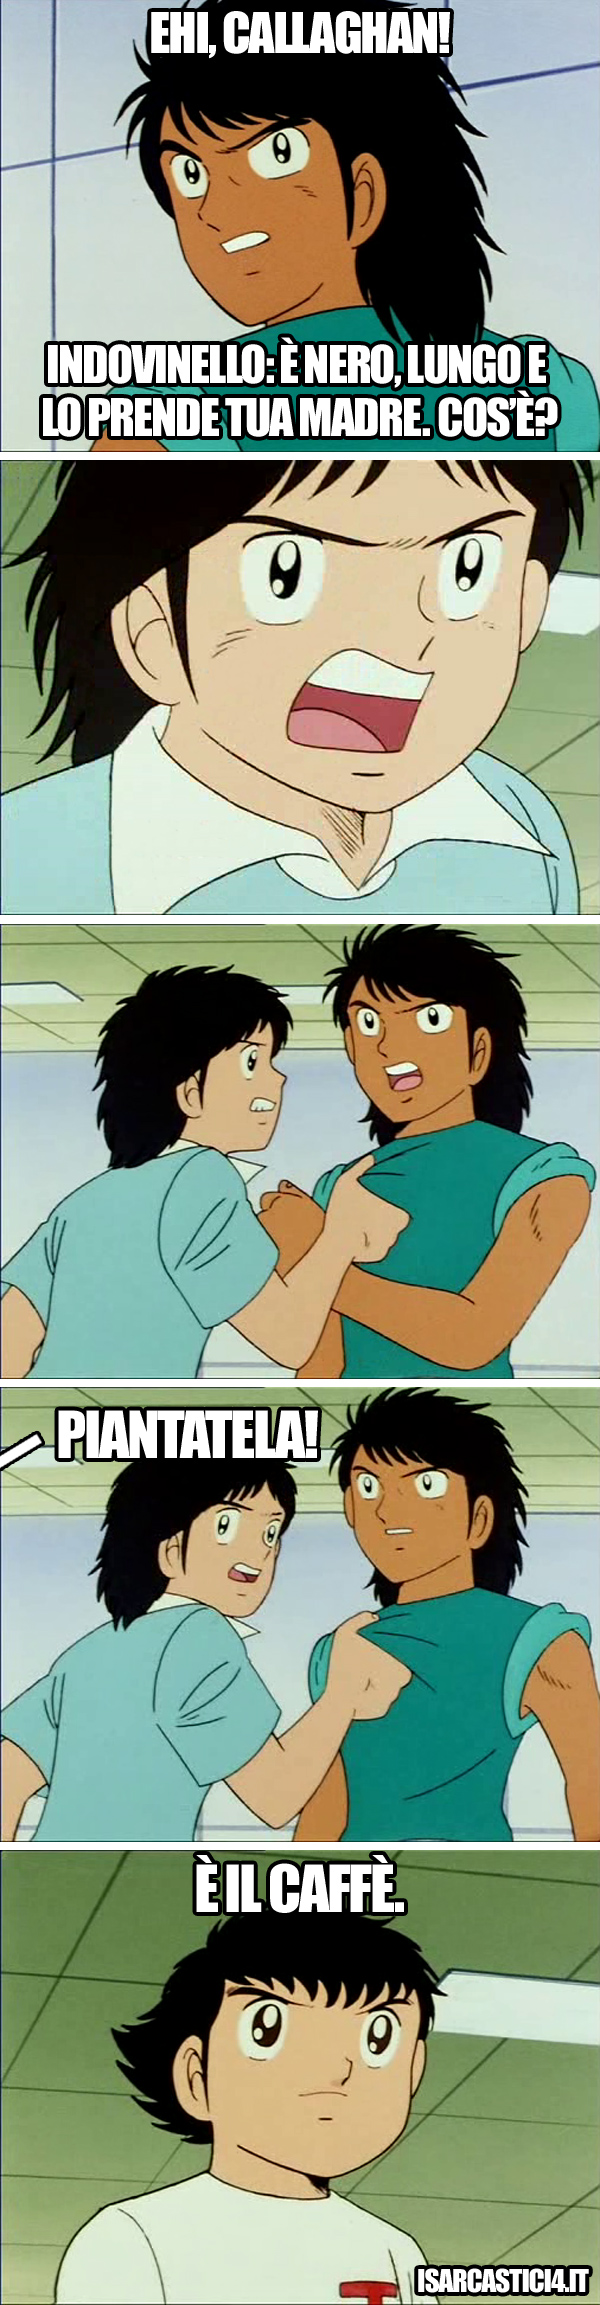 Holly & Benji, Capitan Tsubasa meme ita - Indovinello